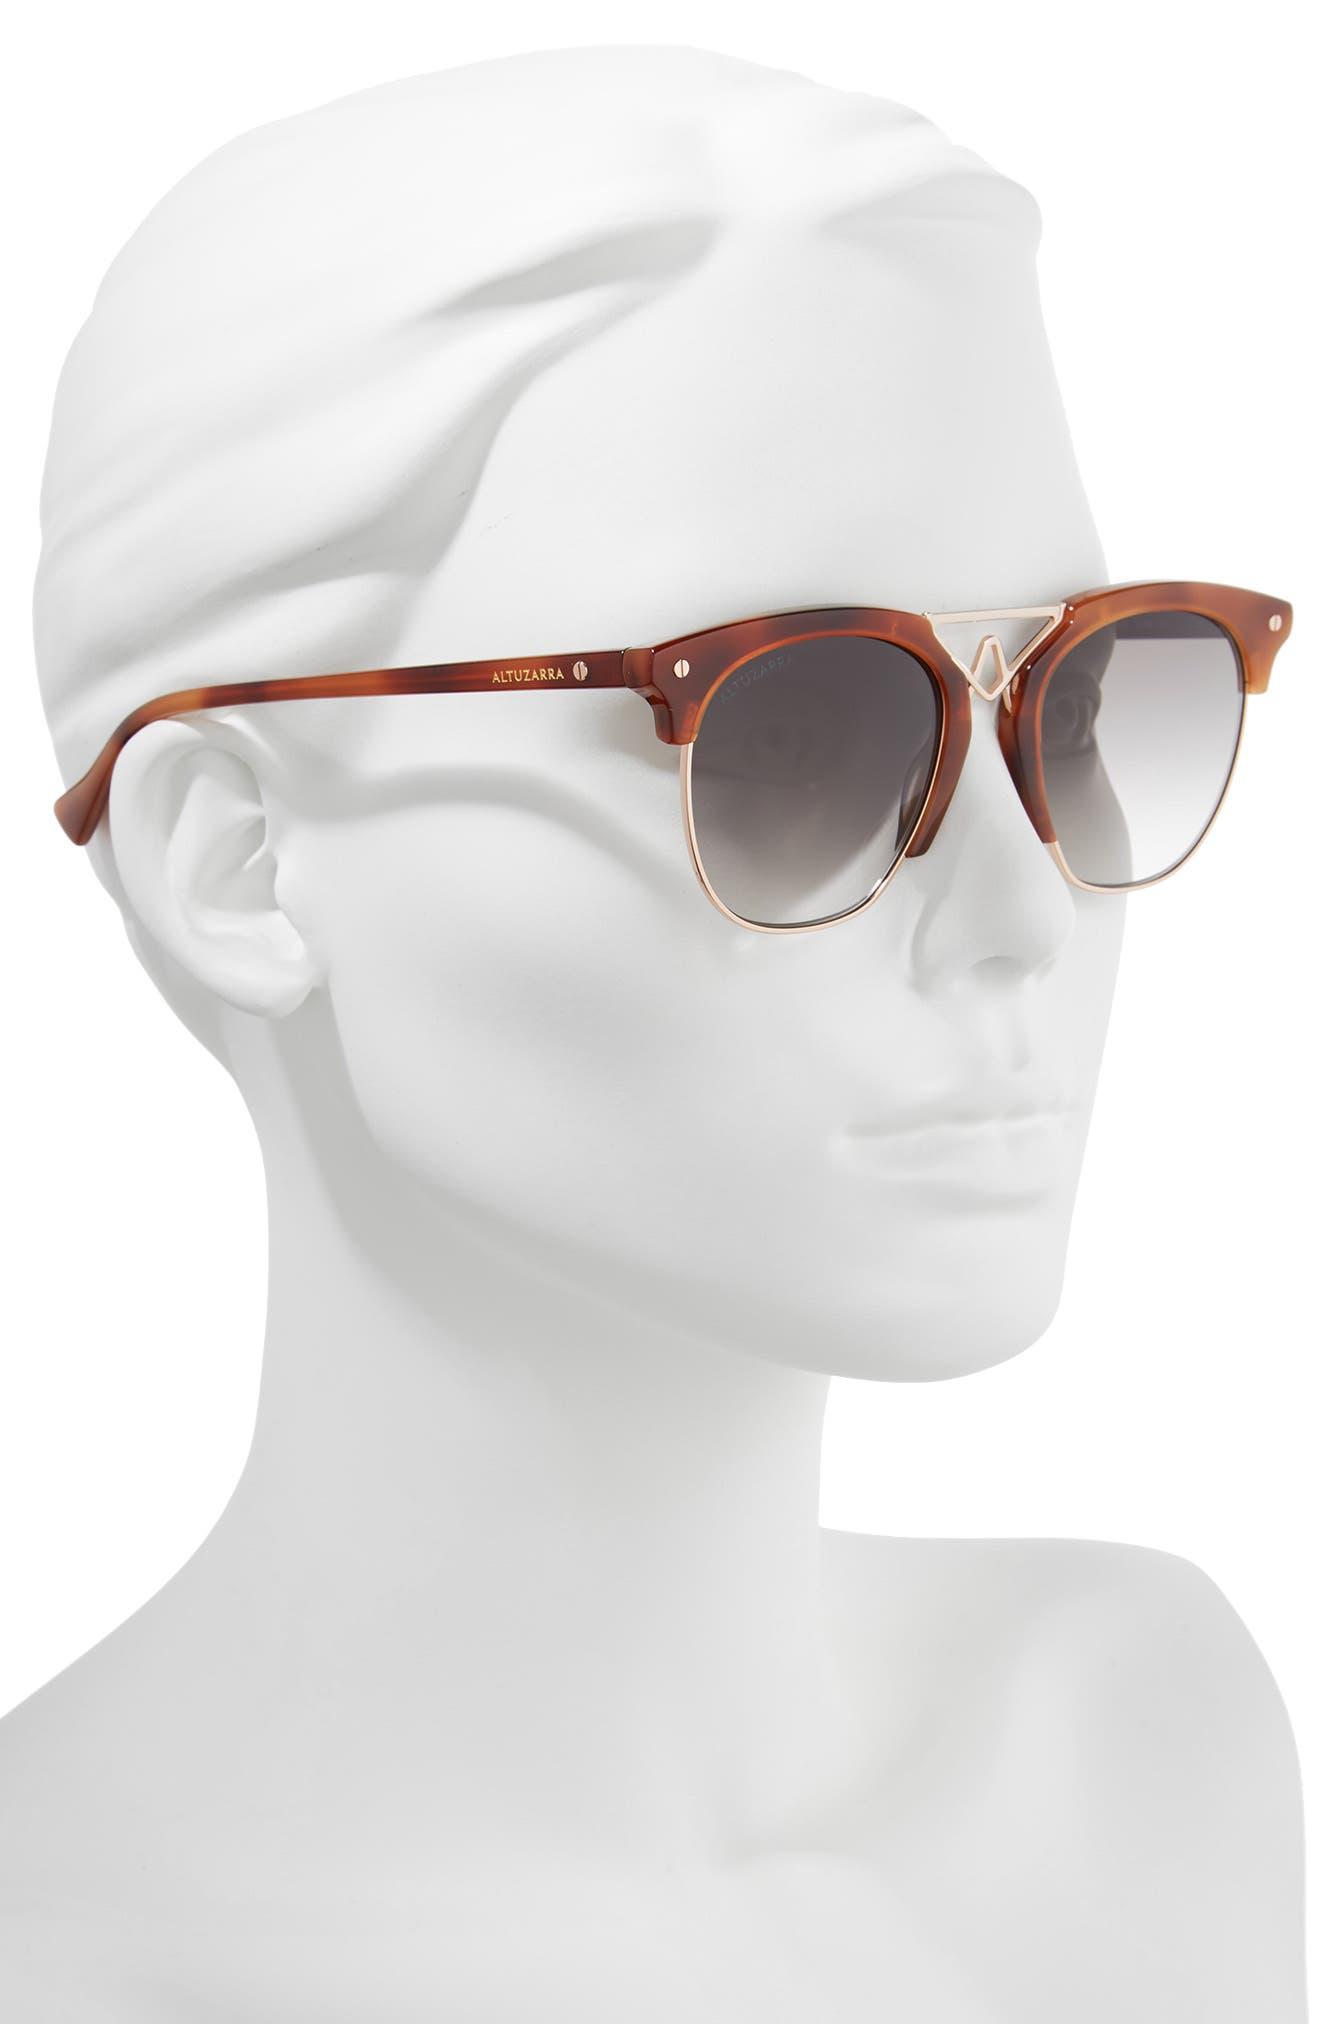 51mm Round Sunglasses,                             Alternate thumbnail 2, color,                             Havana